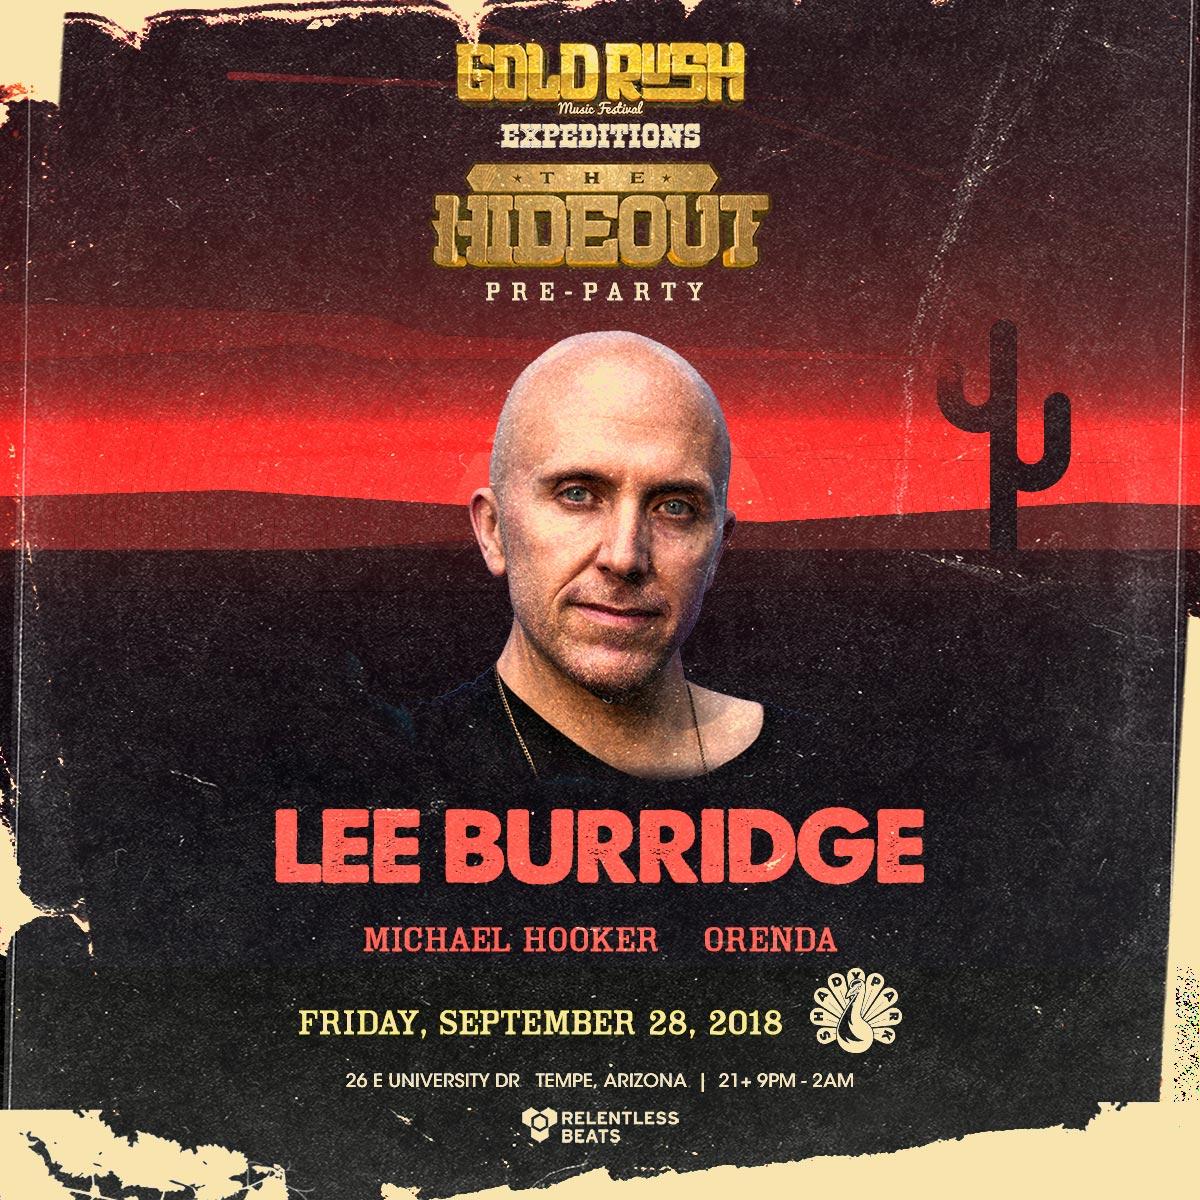 Flyer for Lee Burridge